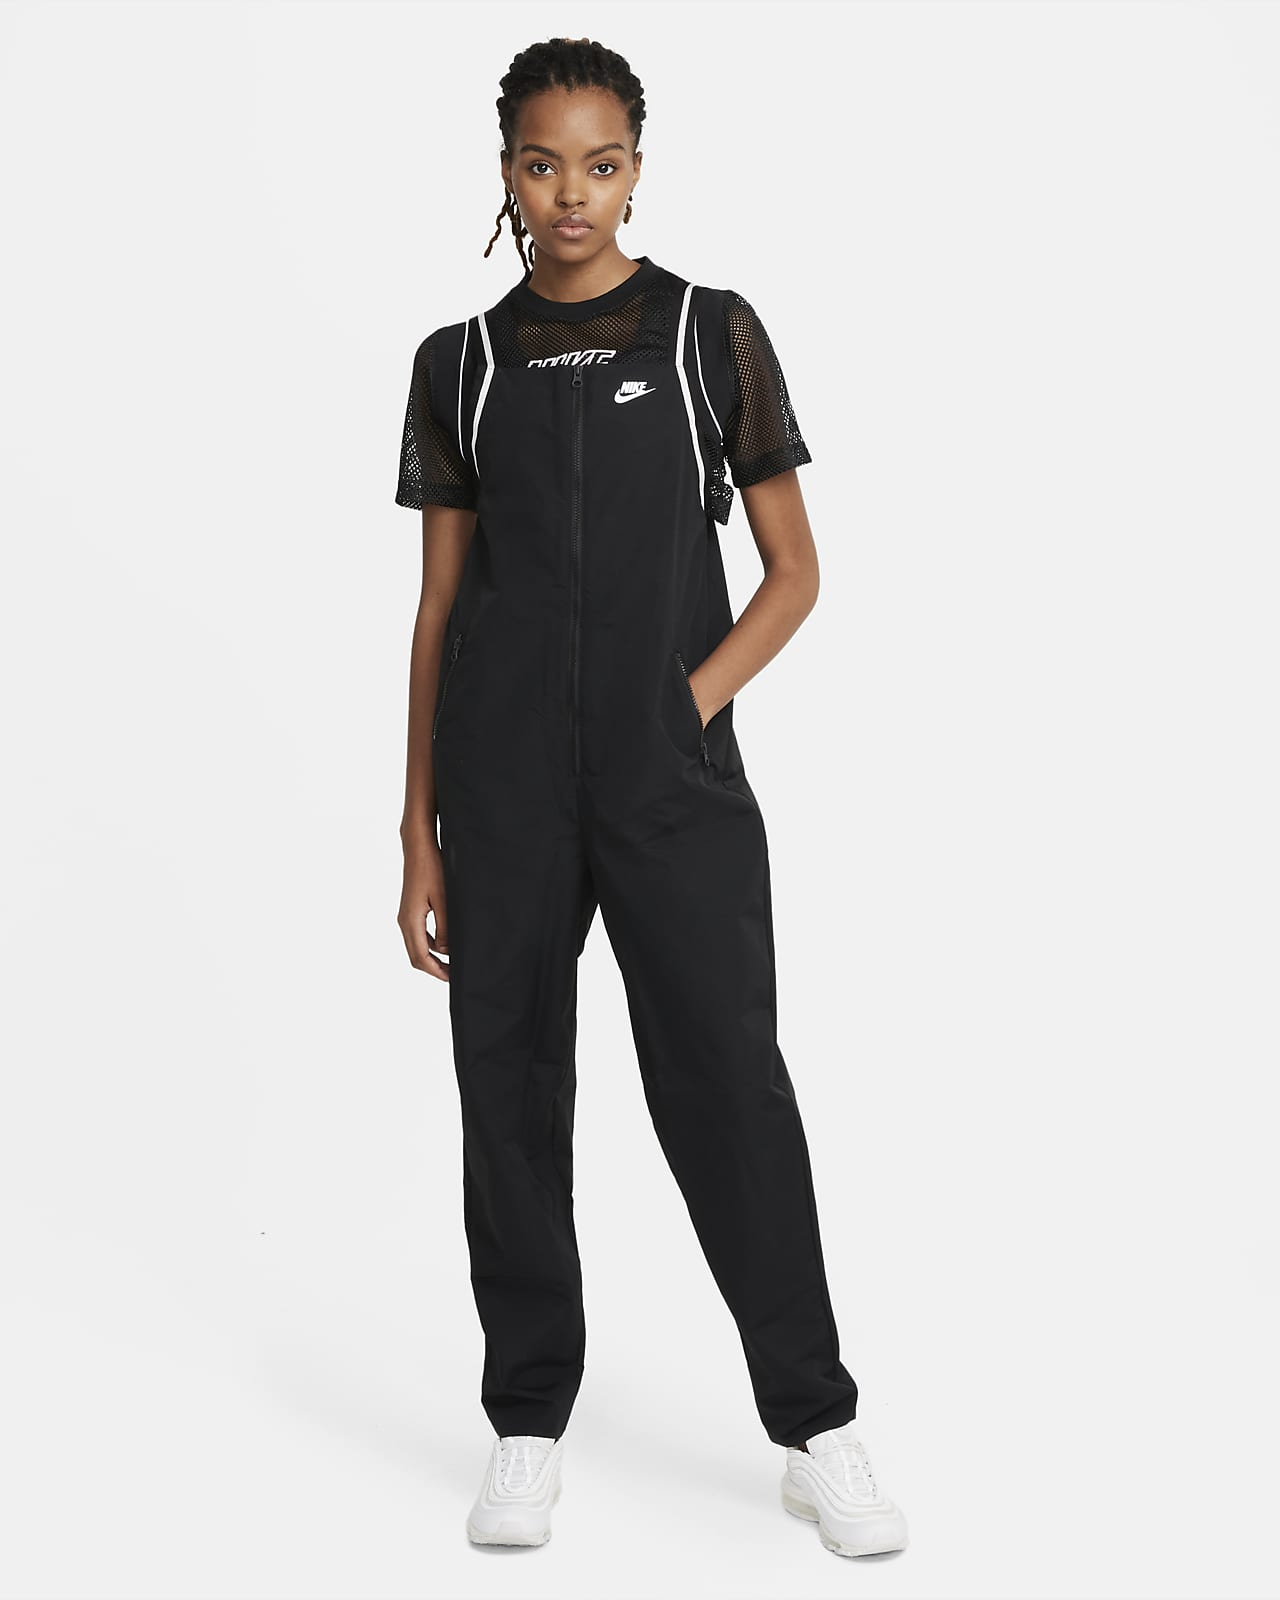 Serena Design Crew Women's Tennis Jumpsuit